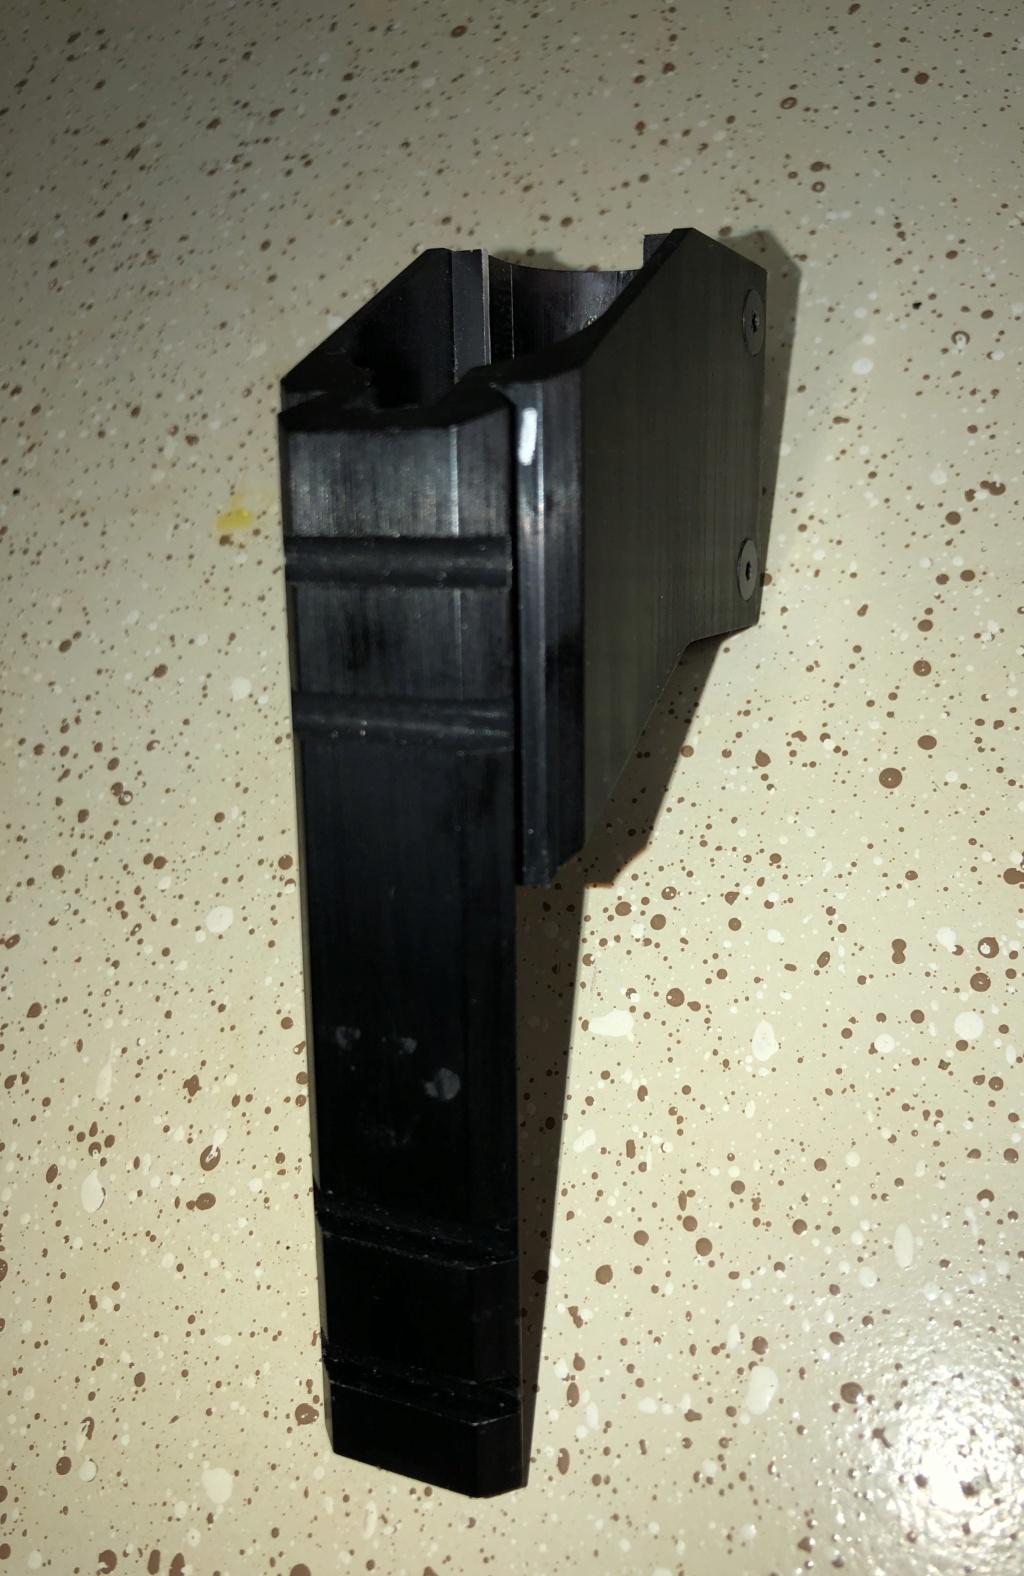 BME M52 weaver rail $65 Shipped SOLD B60d4e10